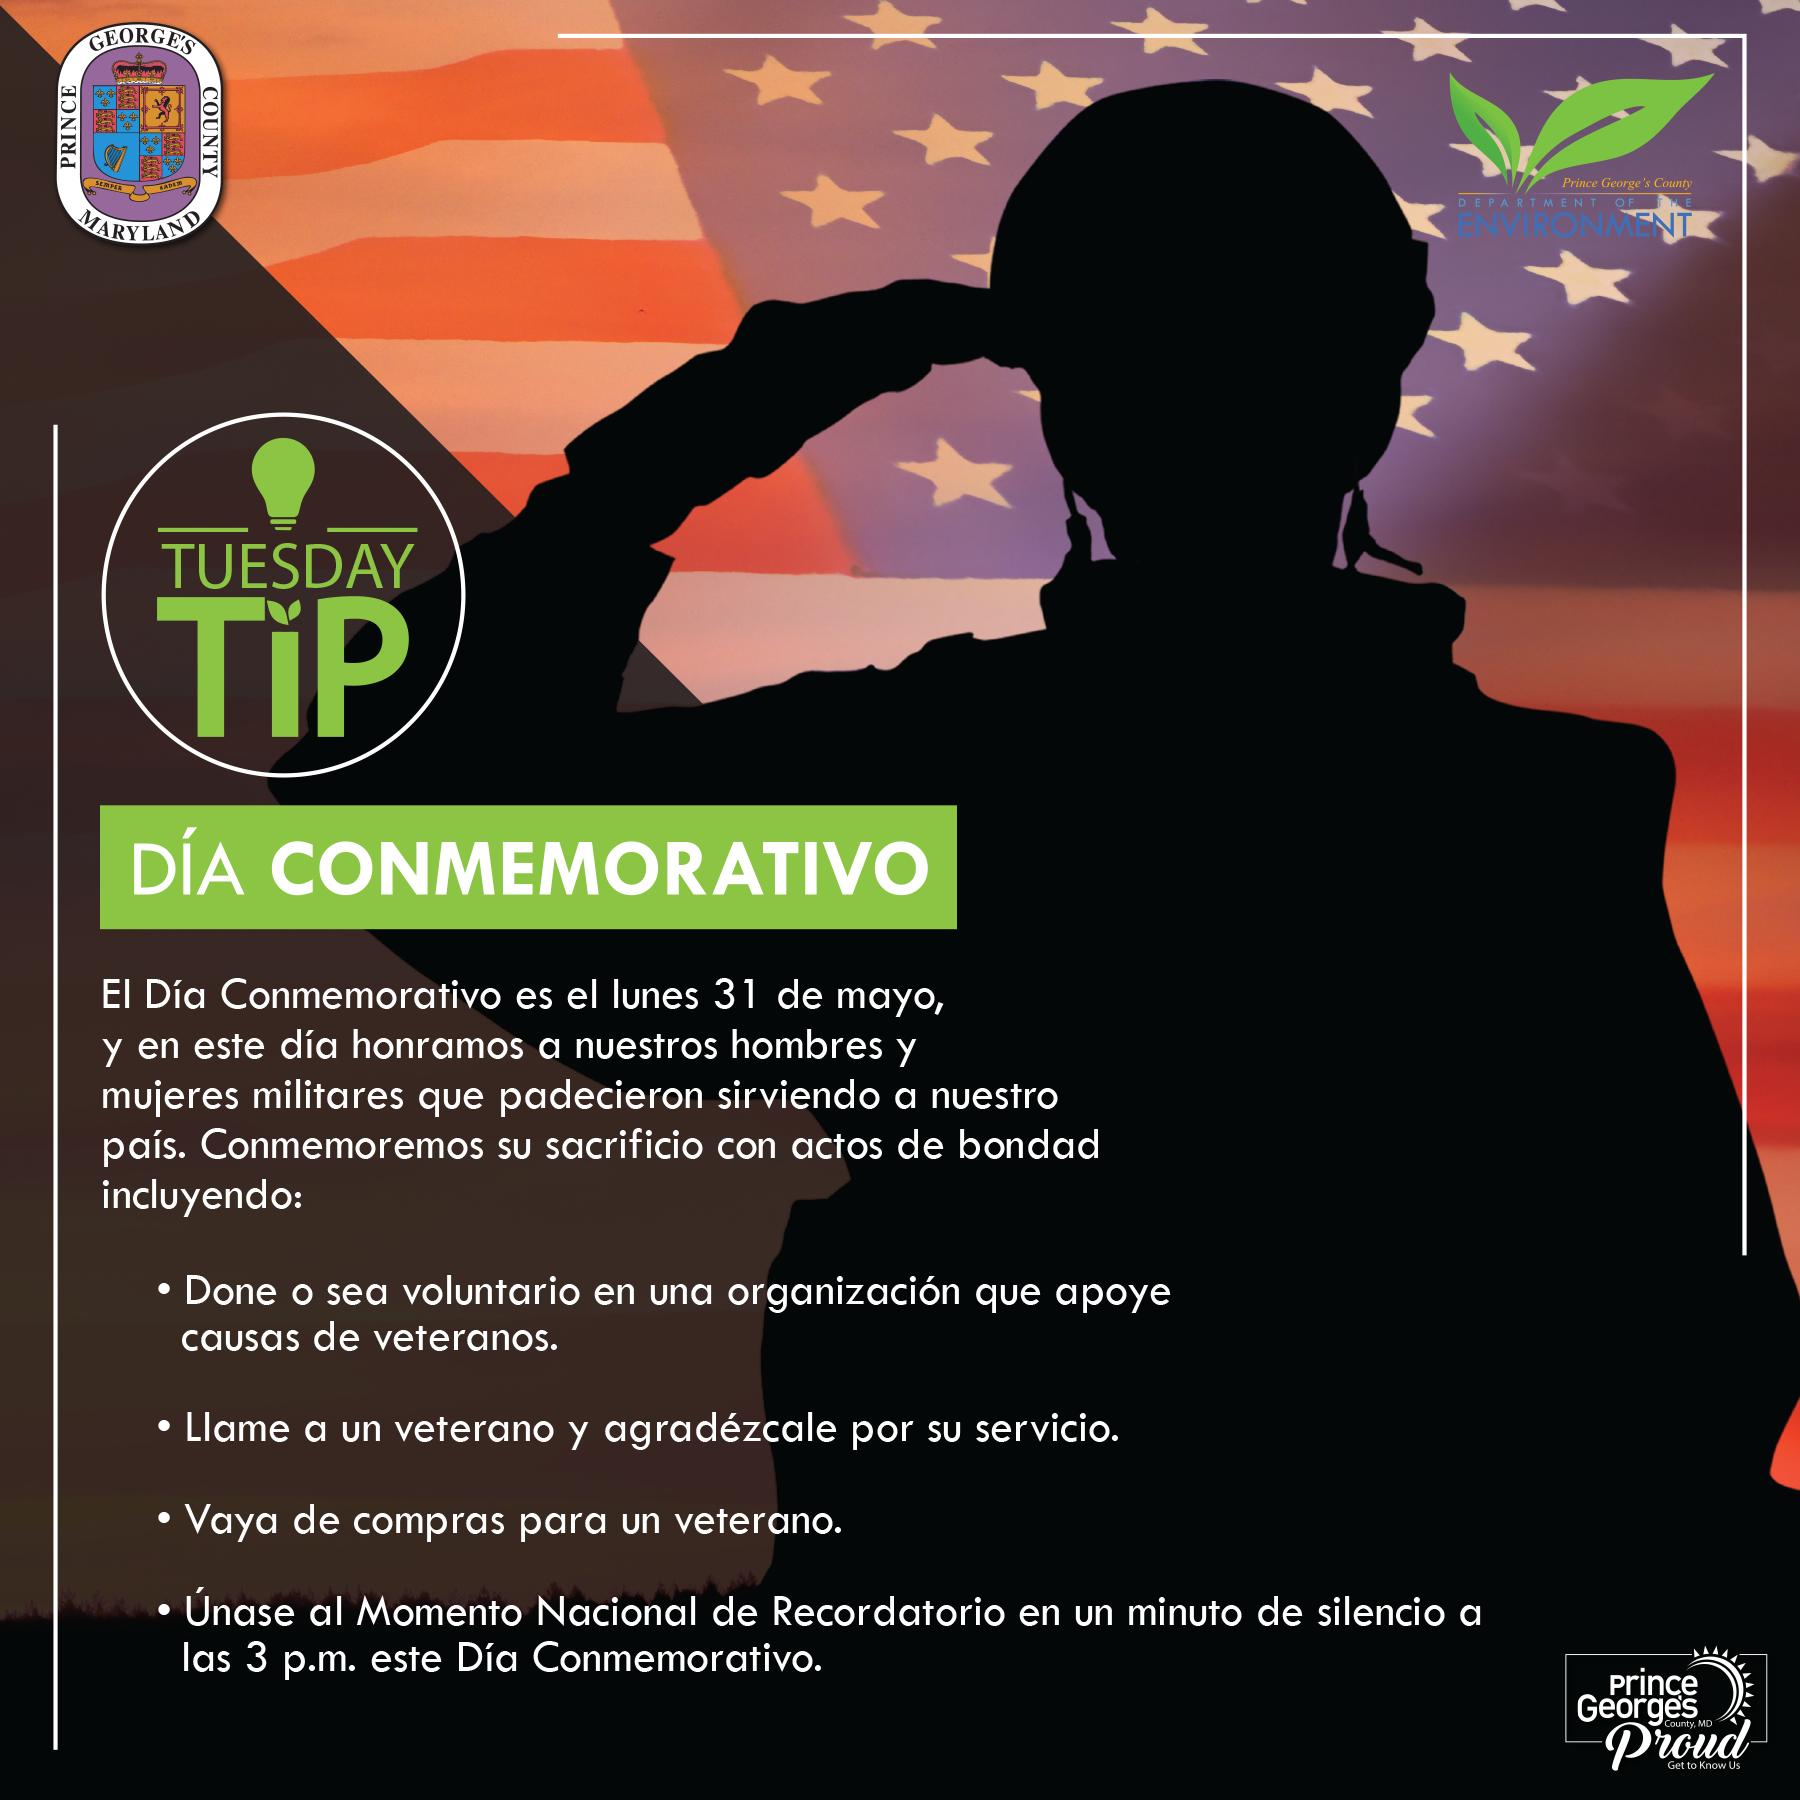 Tues Tip 5.25.21 memorialday SP